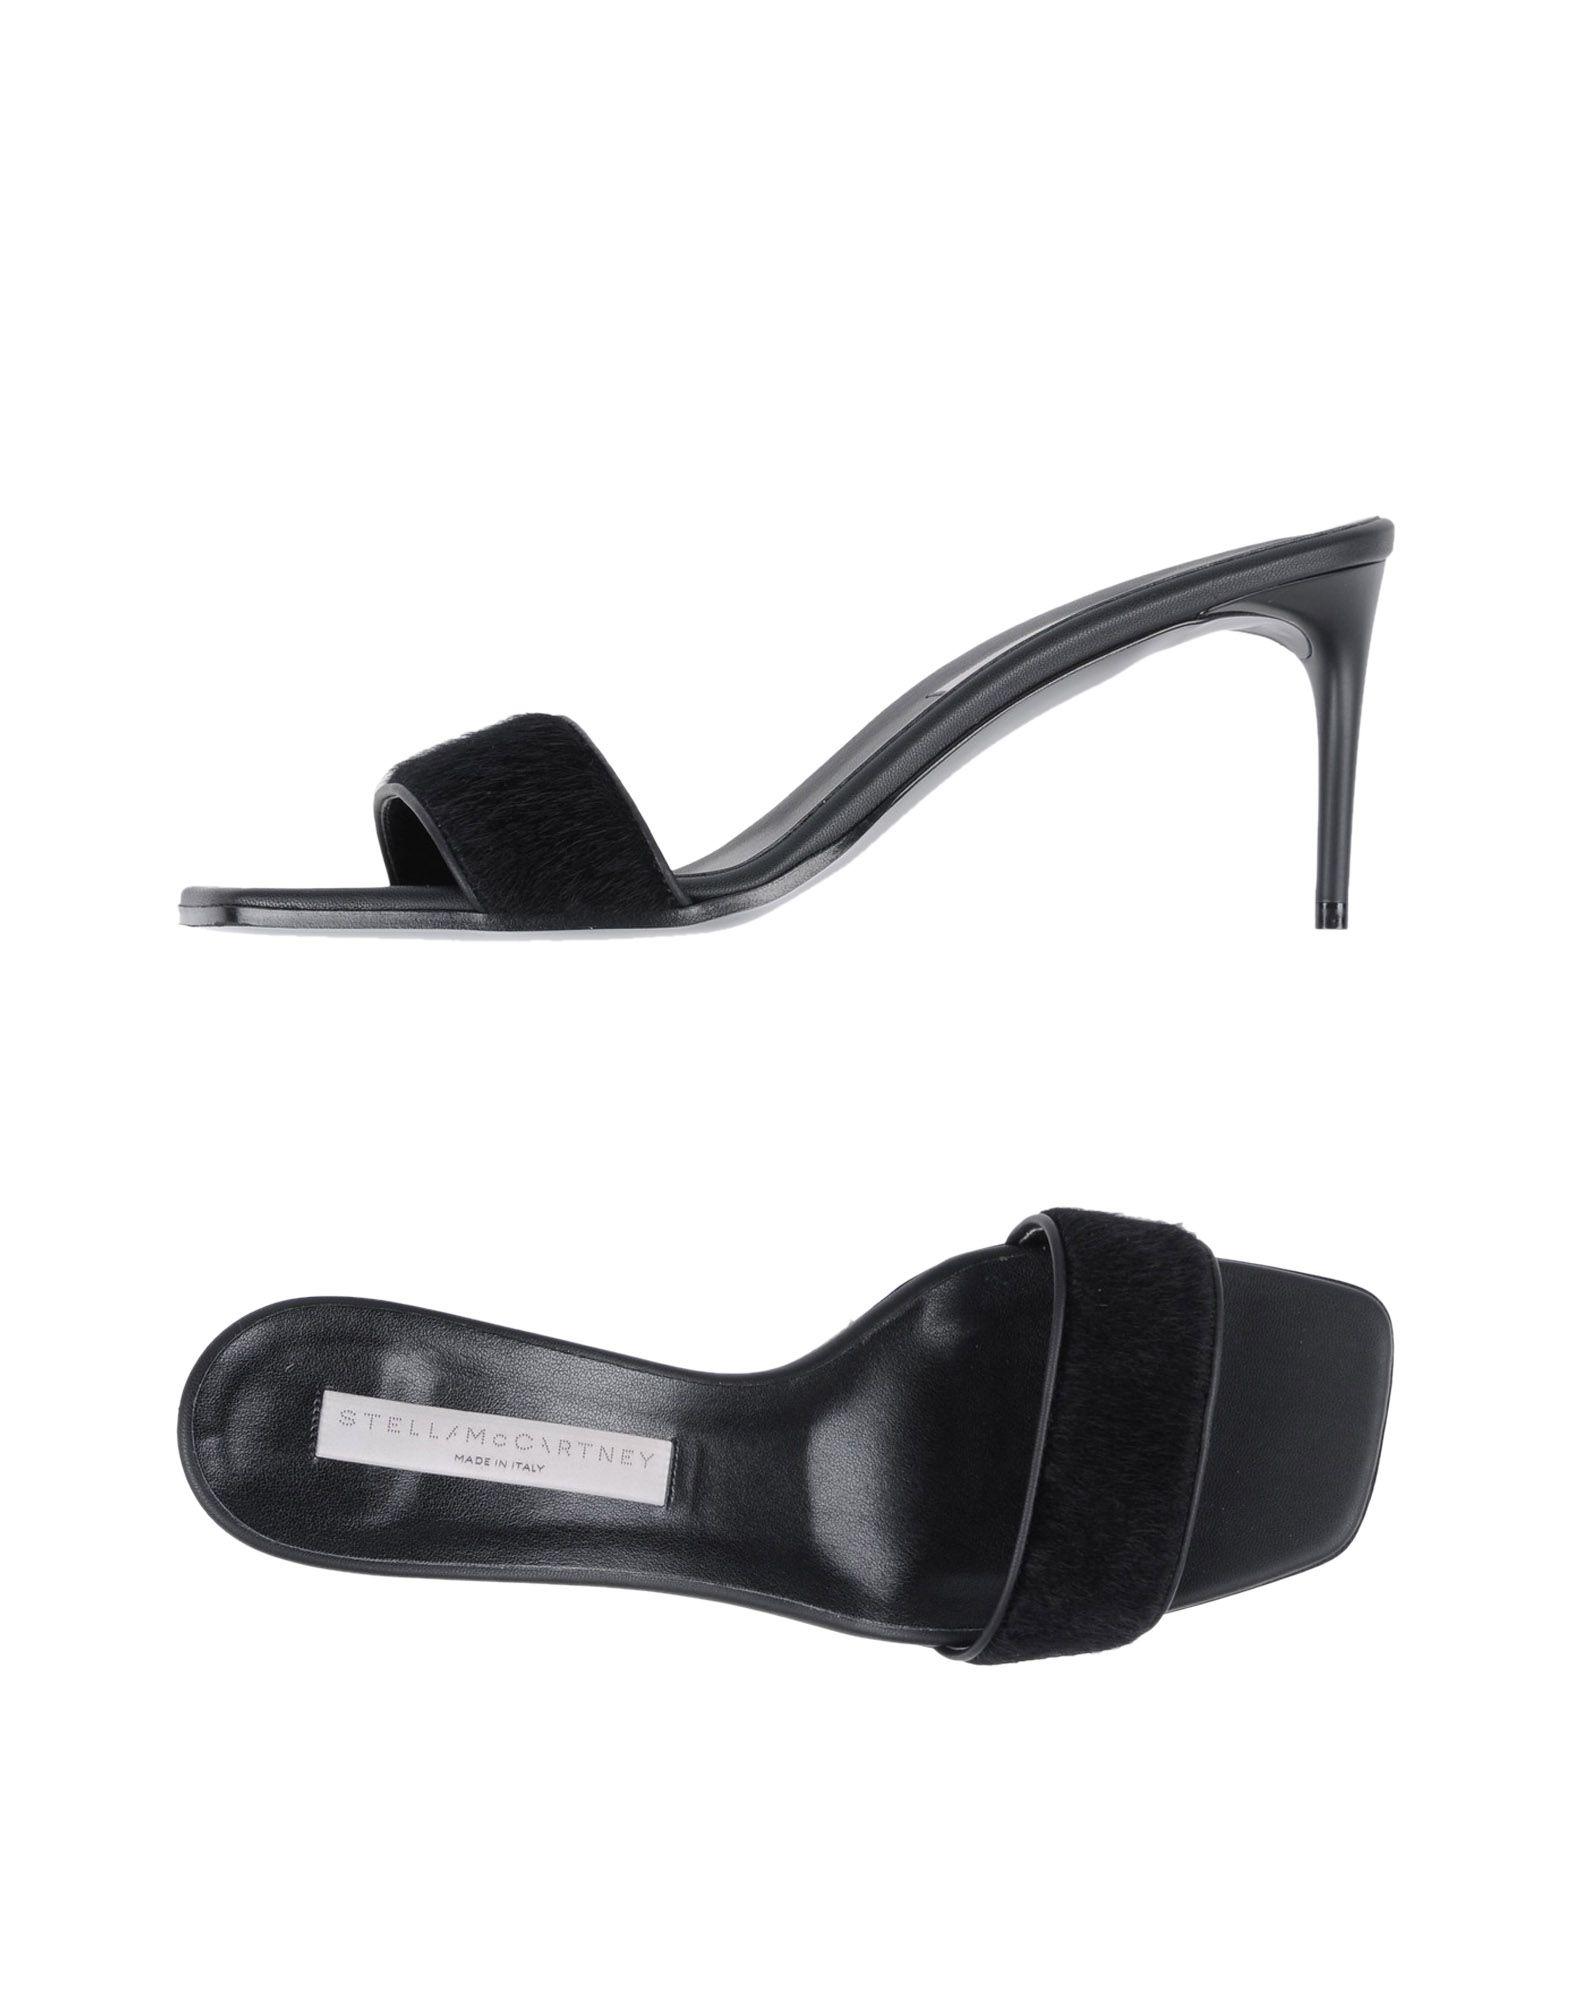 Stella Mccartney Sandalen Damen  11447746HKGut aussehende aussehende aussehende strapazierfähige Schuhe 200ec0